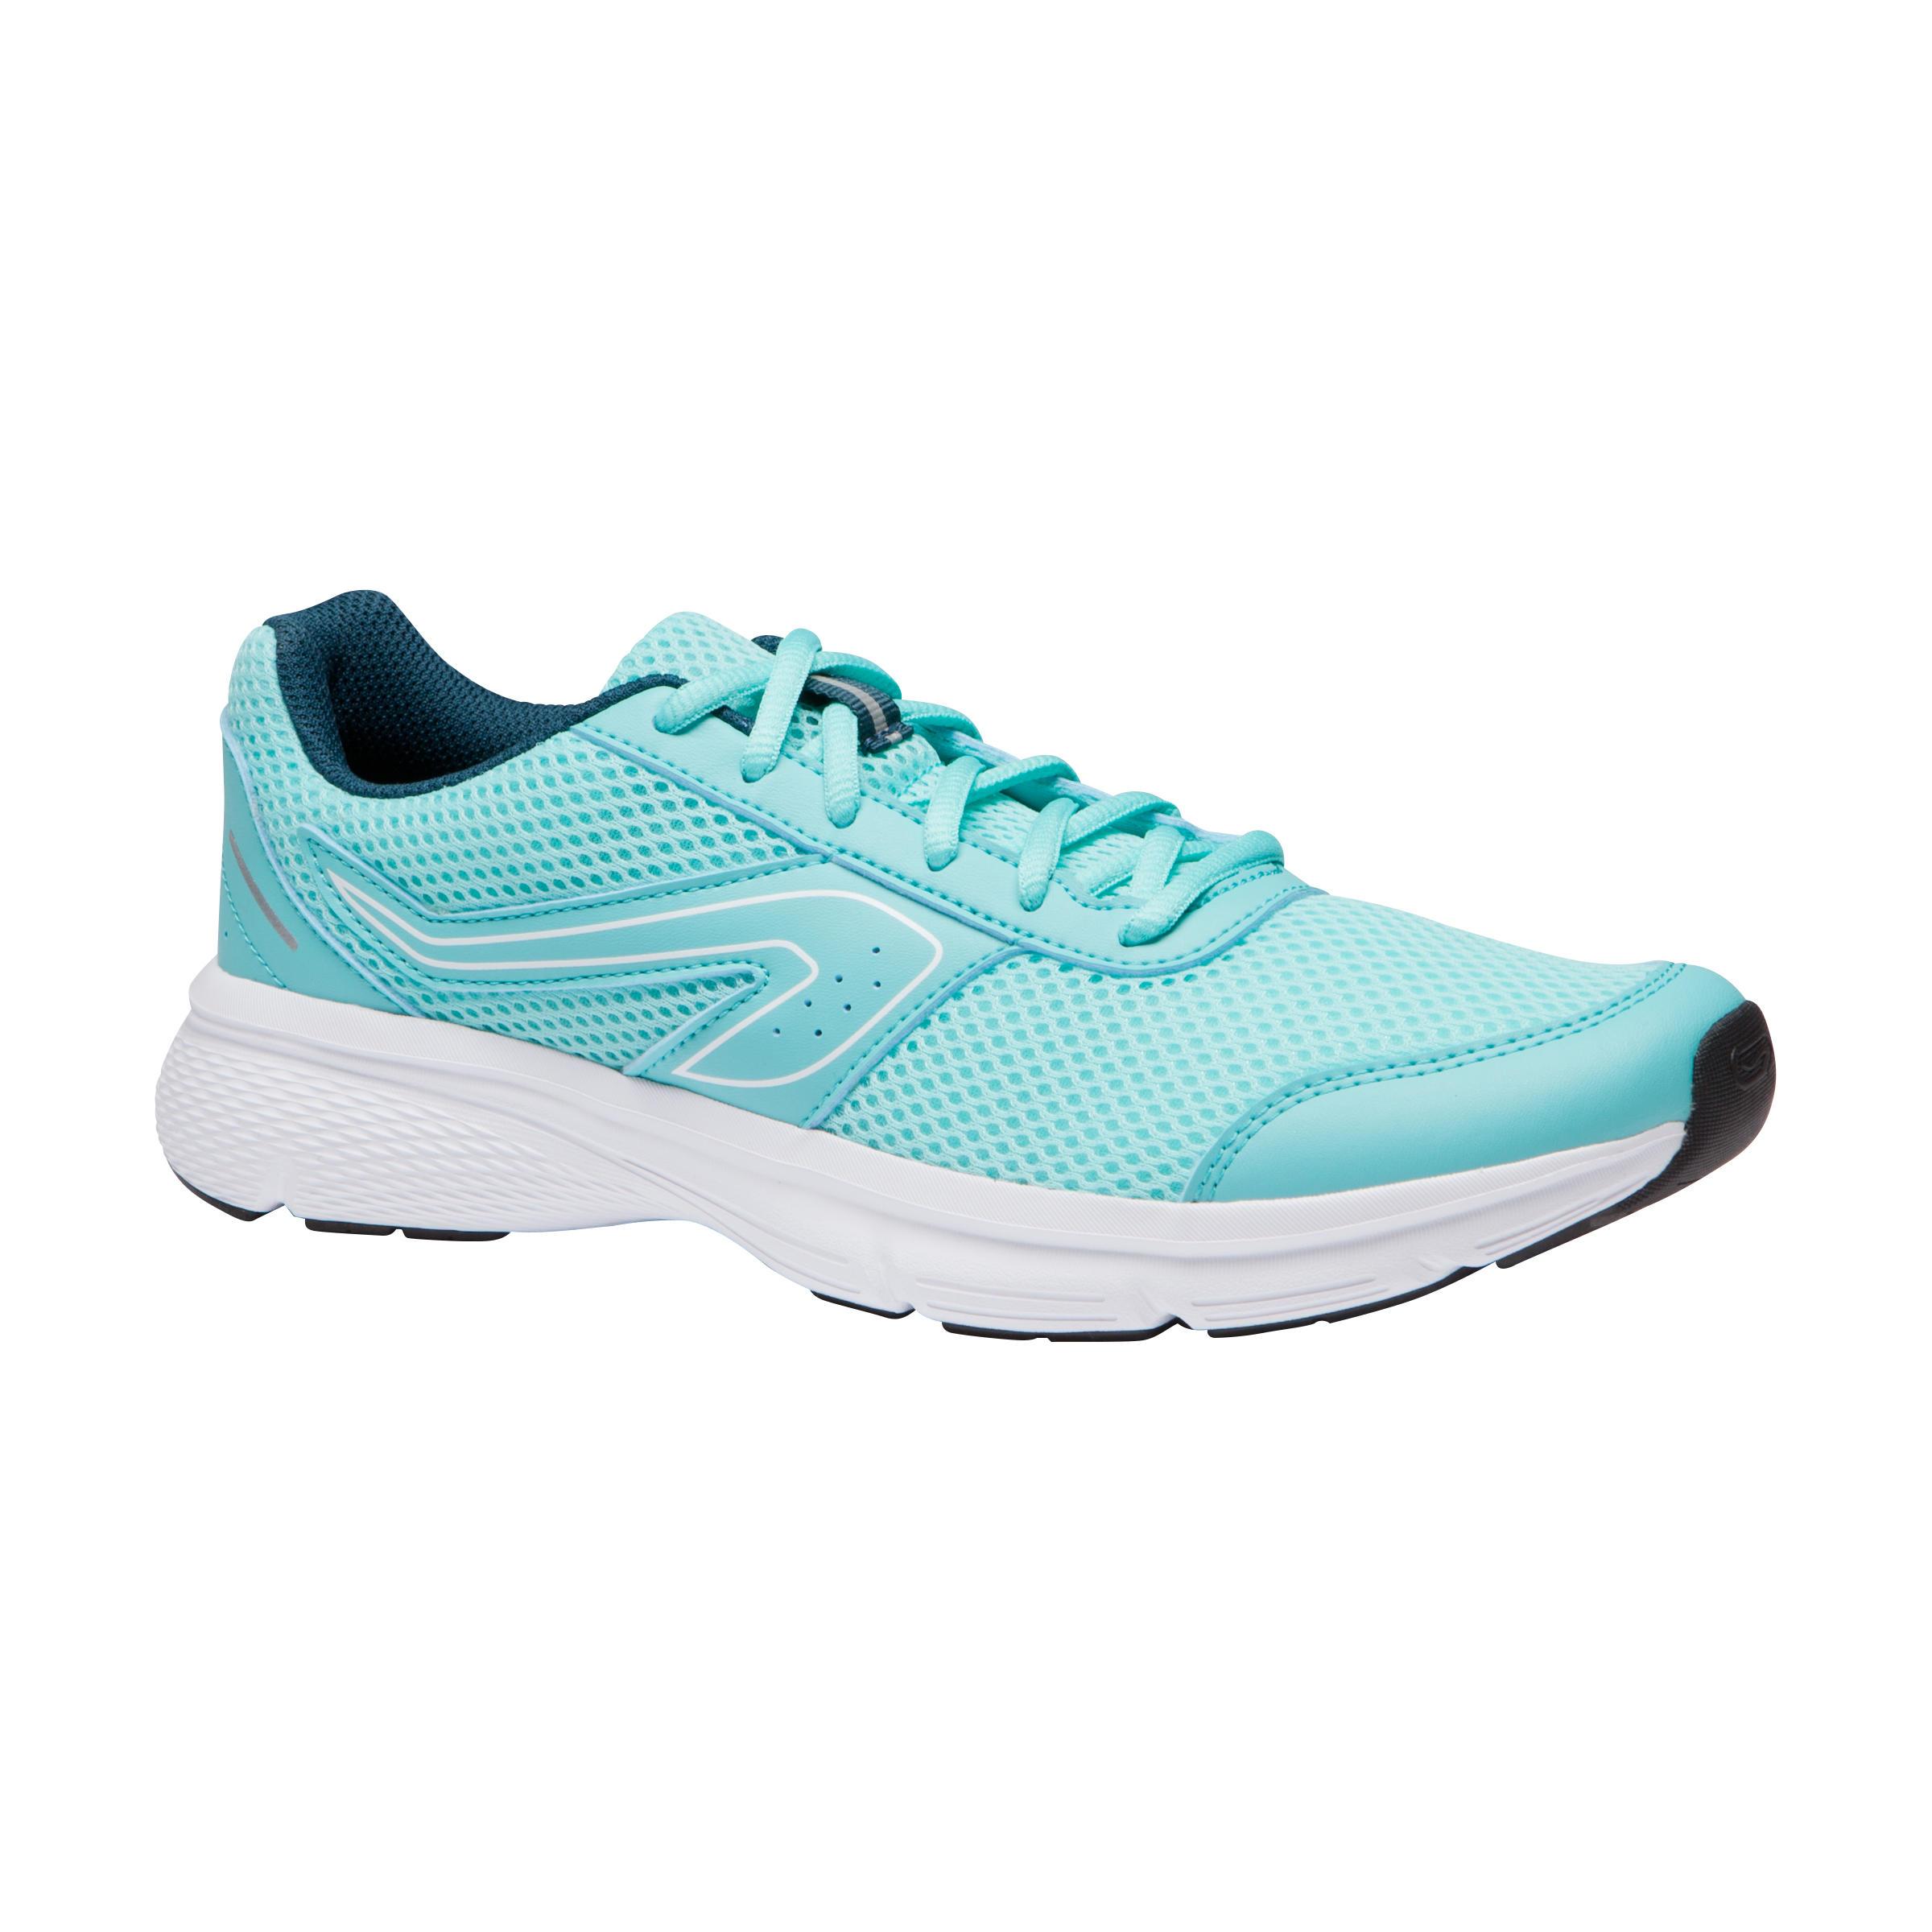 purchase cheap dc795 90f81 Comprar Zapatillas de Running Mujer Online | Decathlon